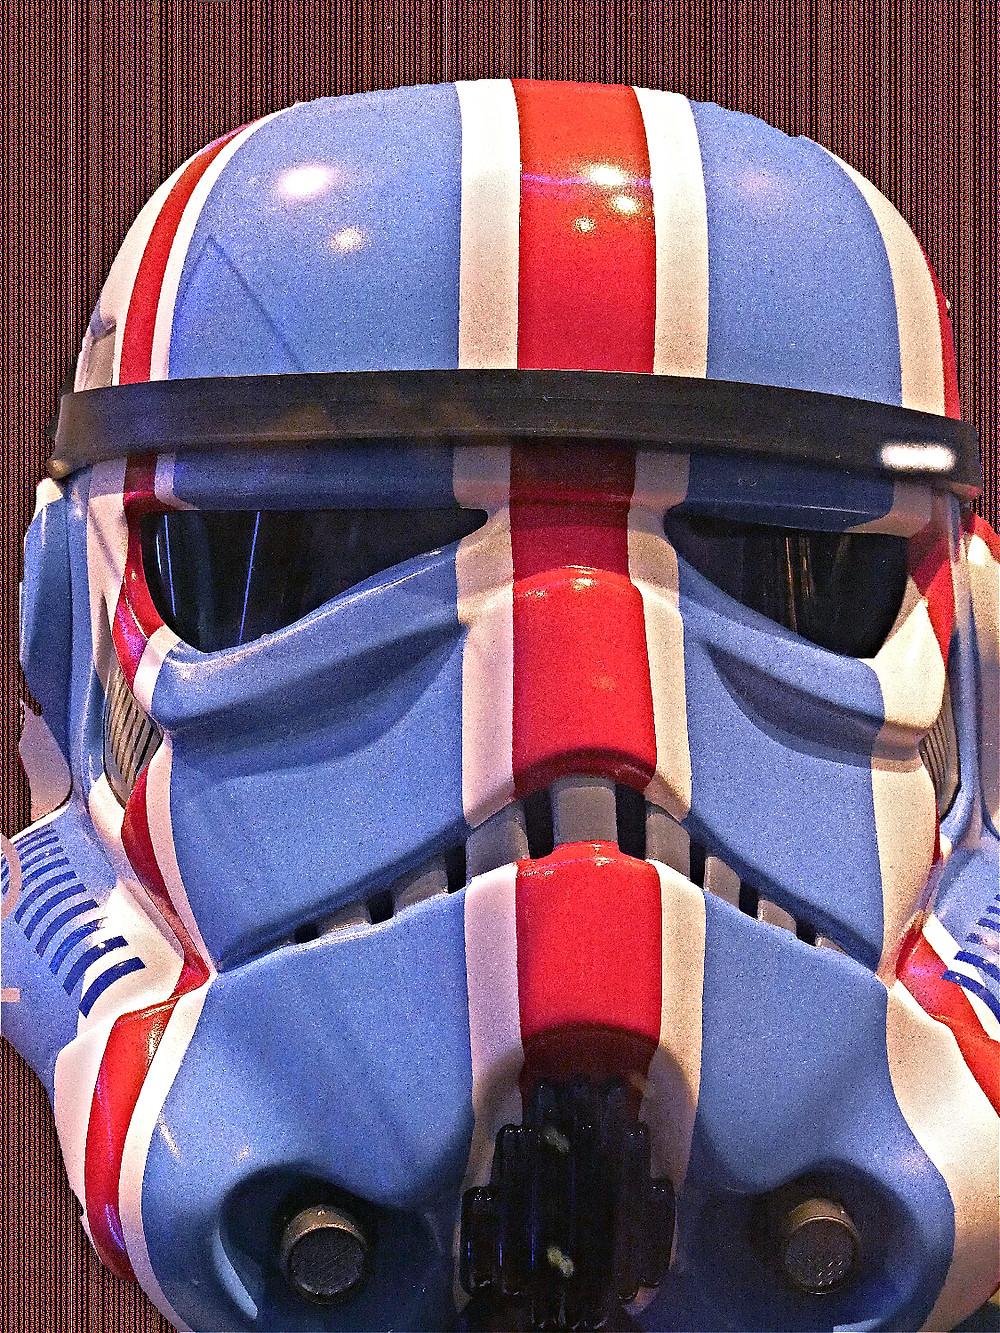 British stormtrooper